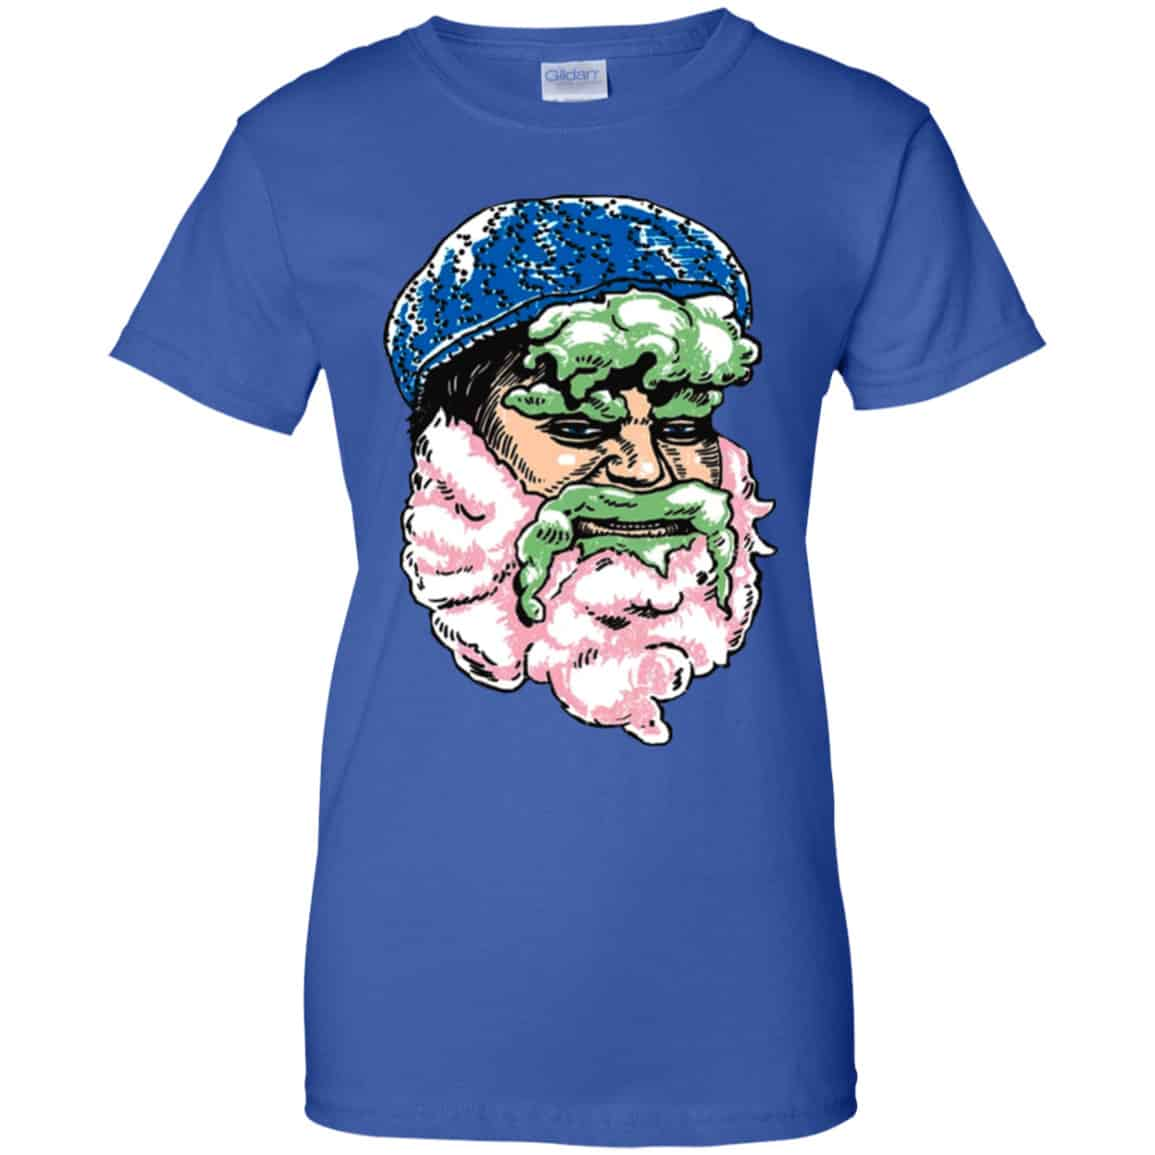 Cotton Candy Randy Shirt, Hoodie, Tank | 0sTees